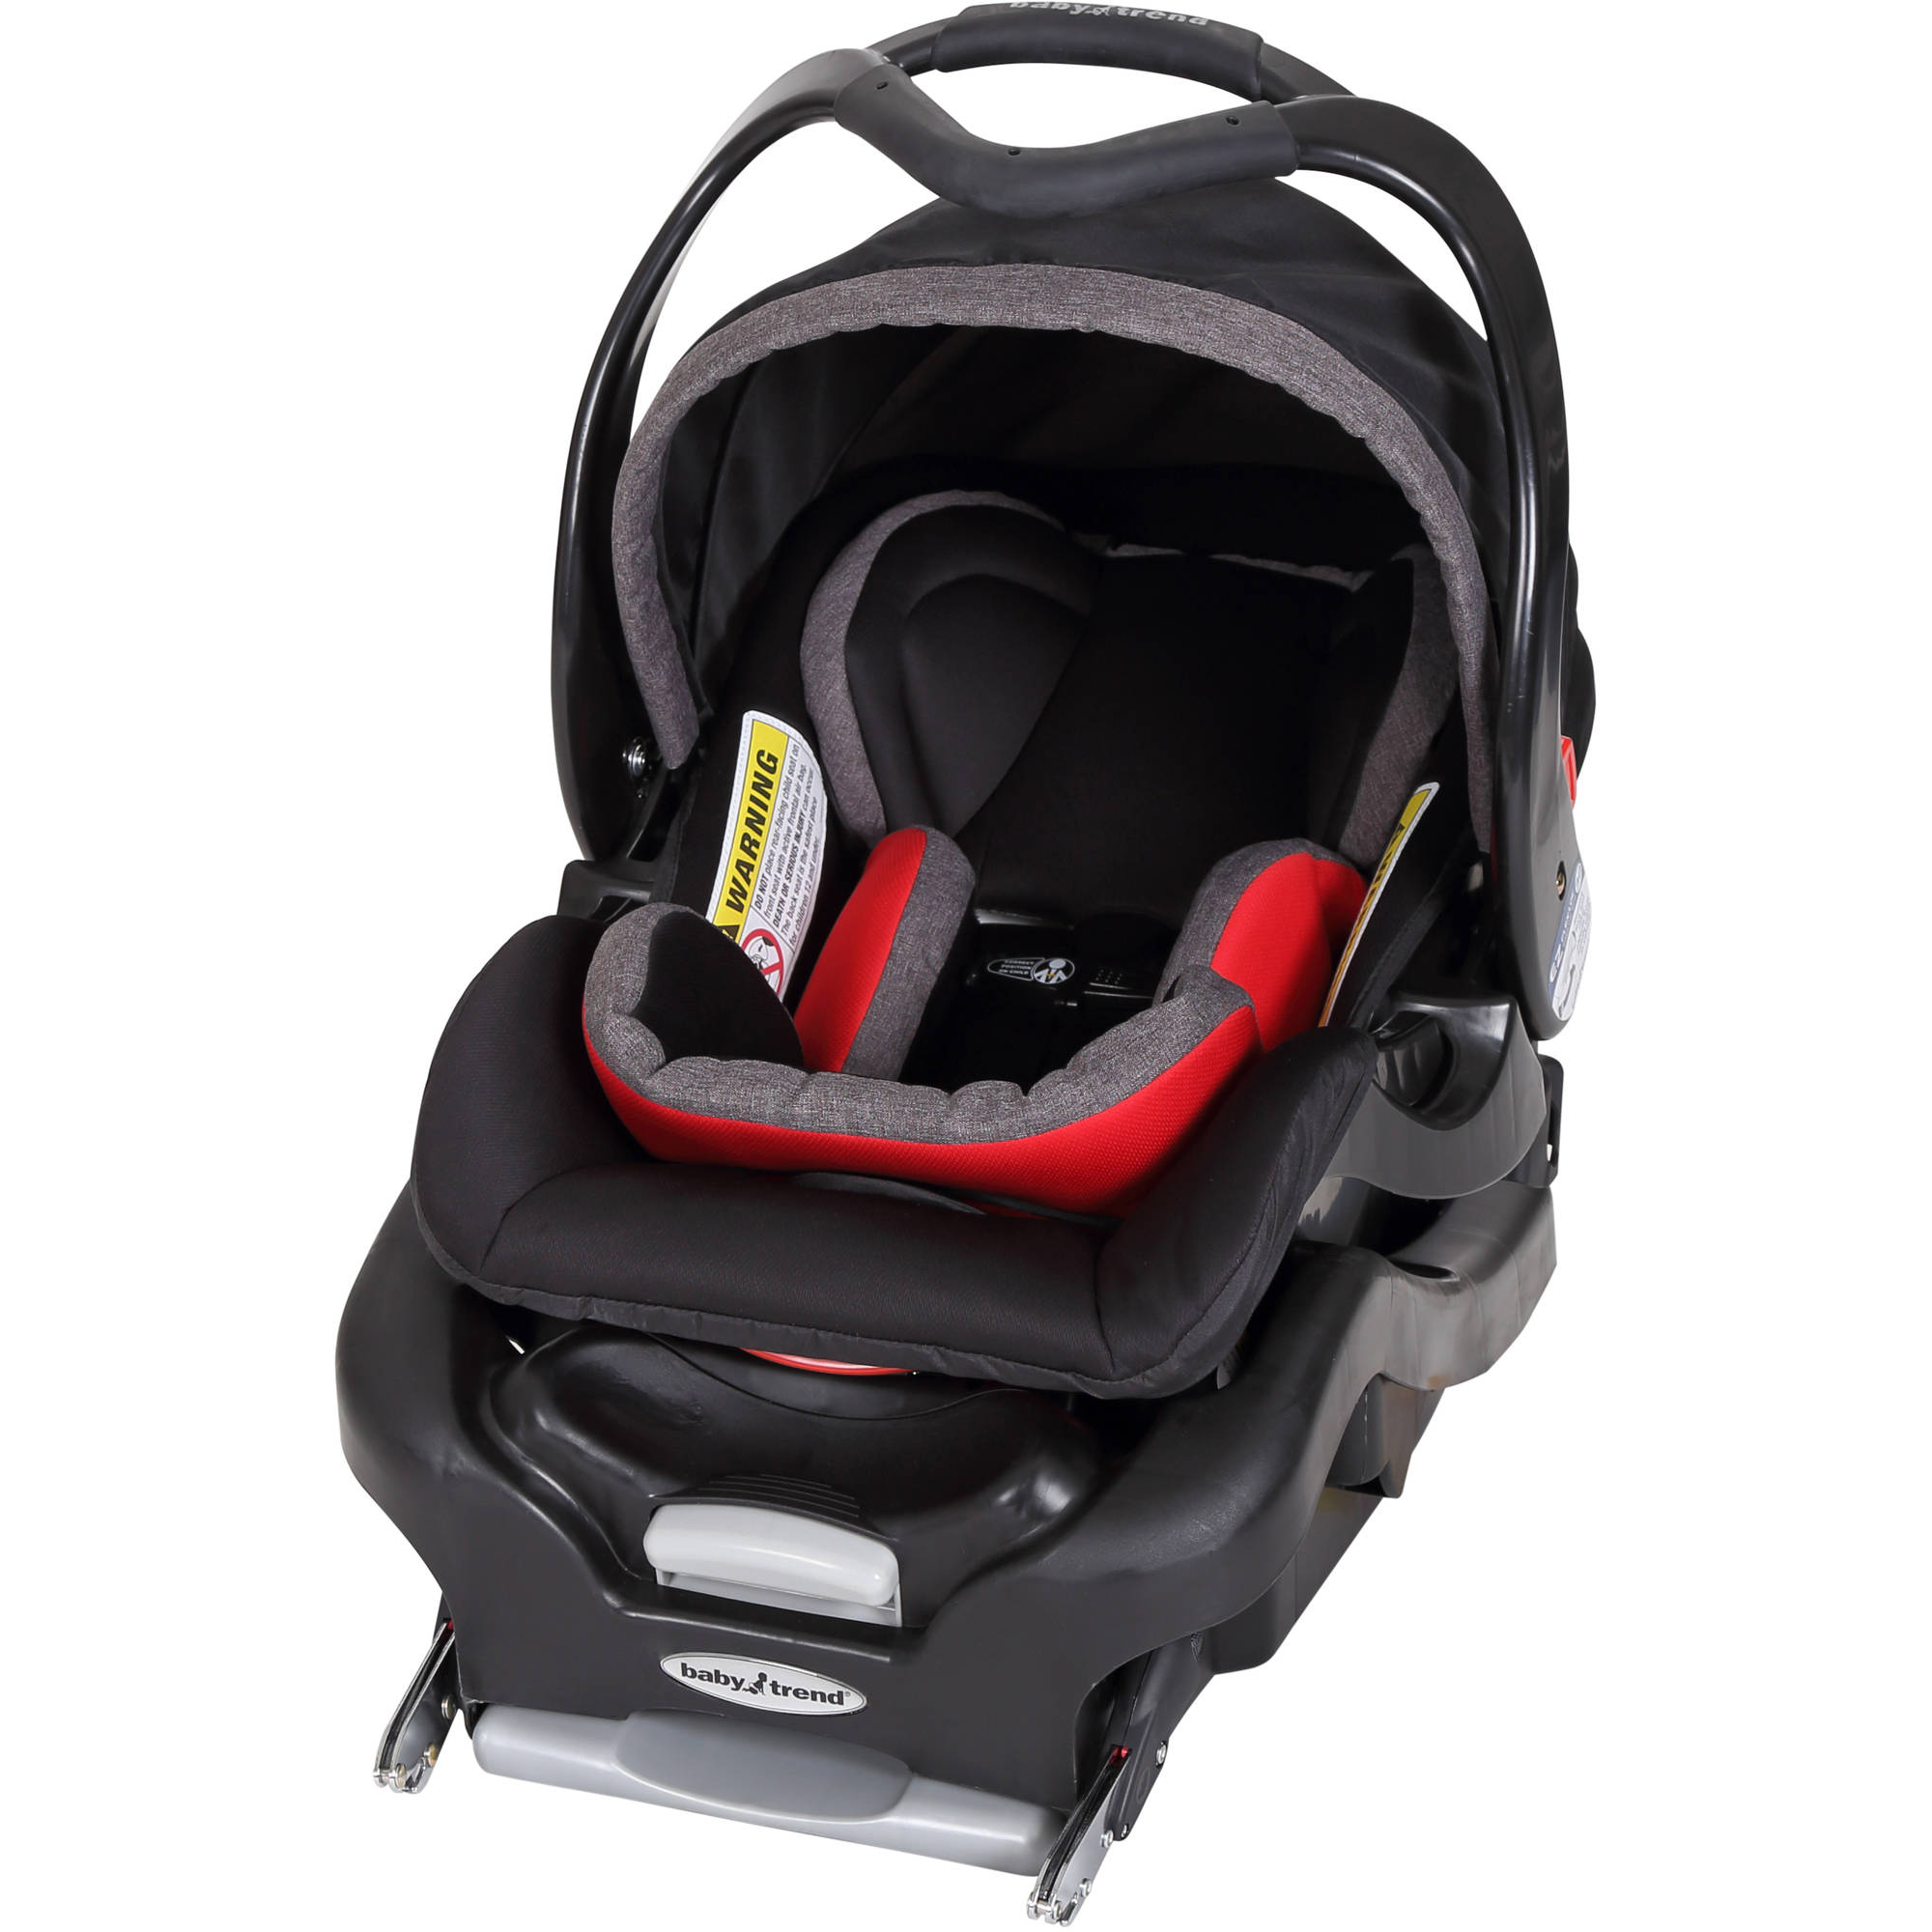 baby trend car seat travel cover velcromag. Black Bedroom Furniture Sets. Home Design Ideas